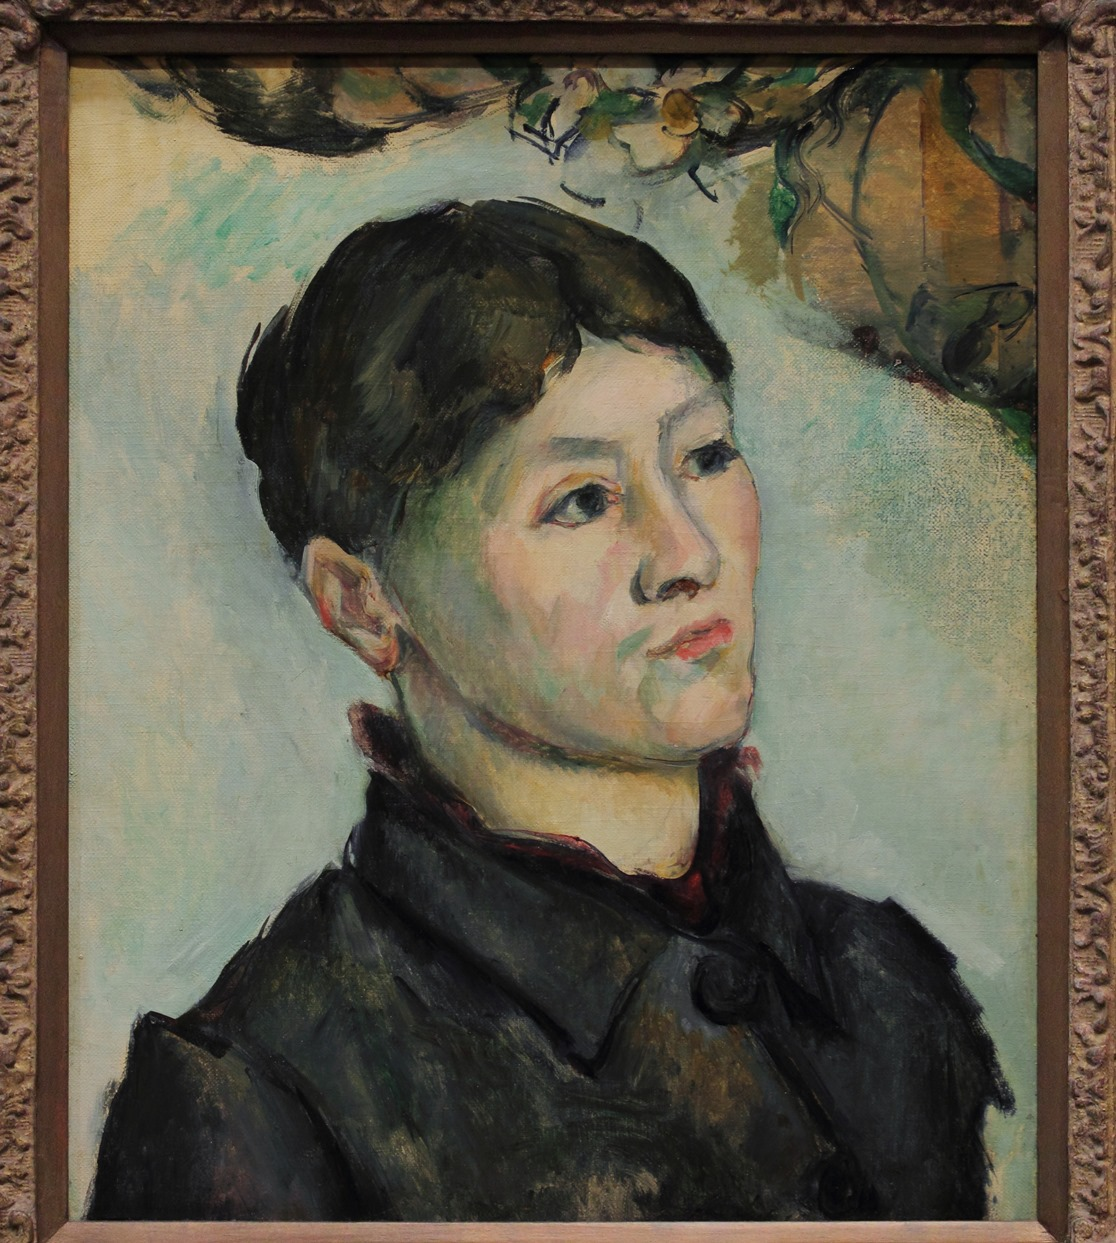 Cezanne madame cezanne 1885_1887